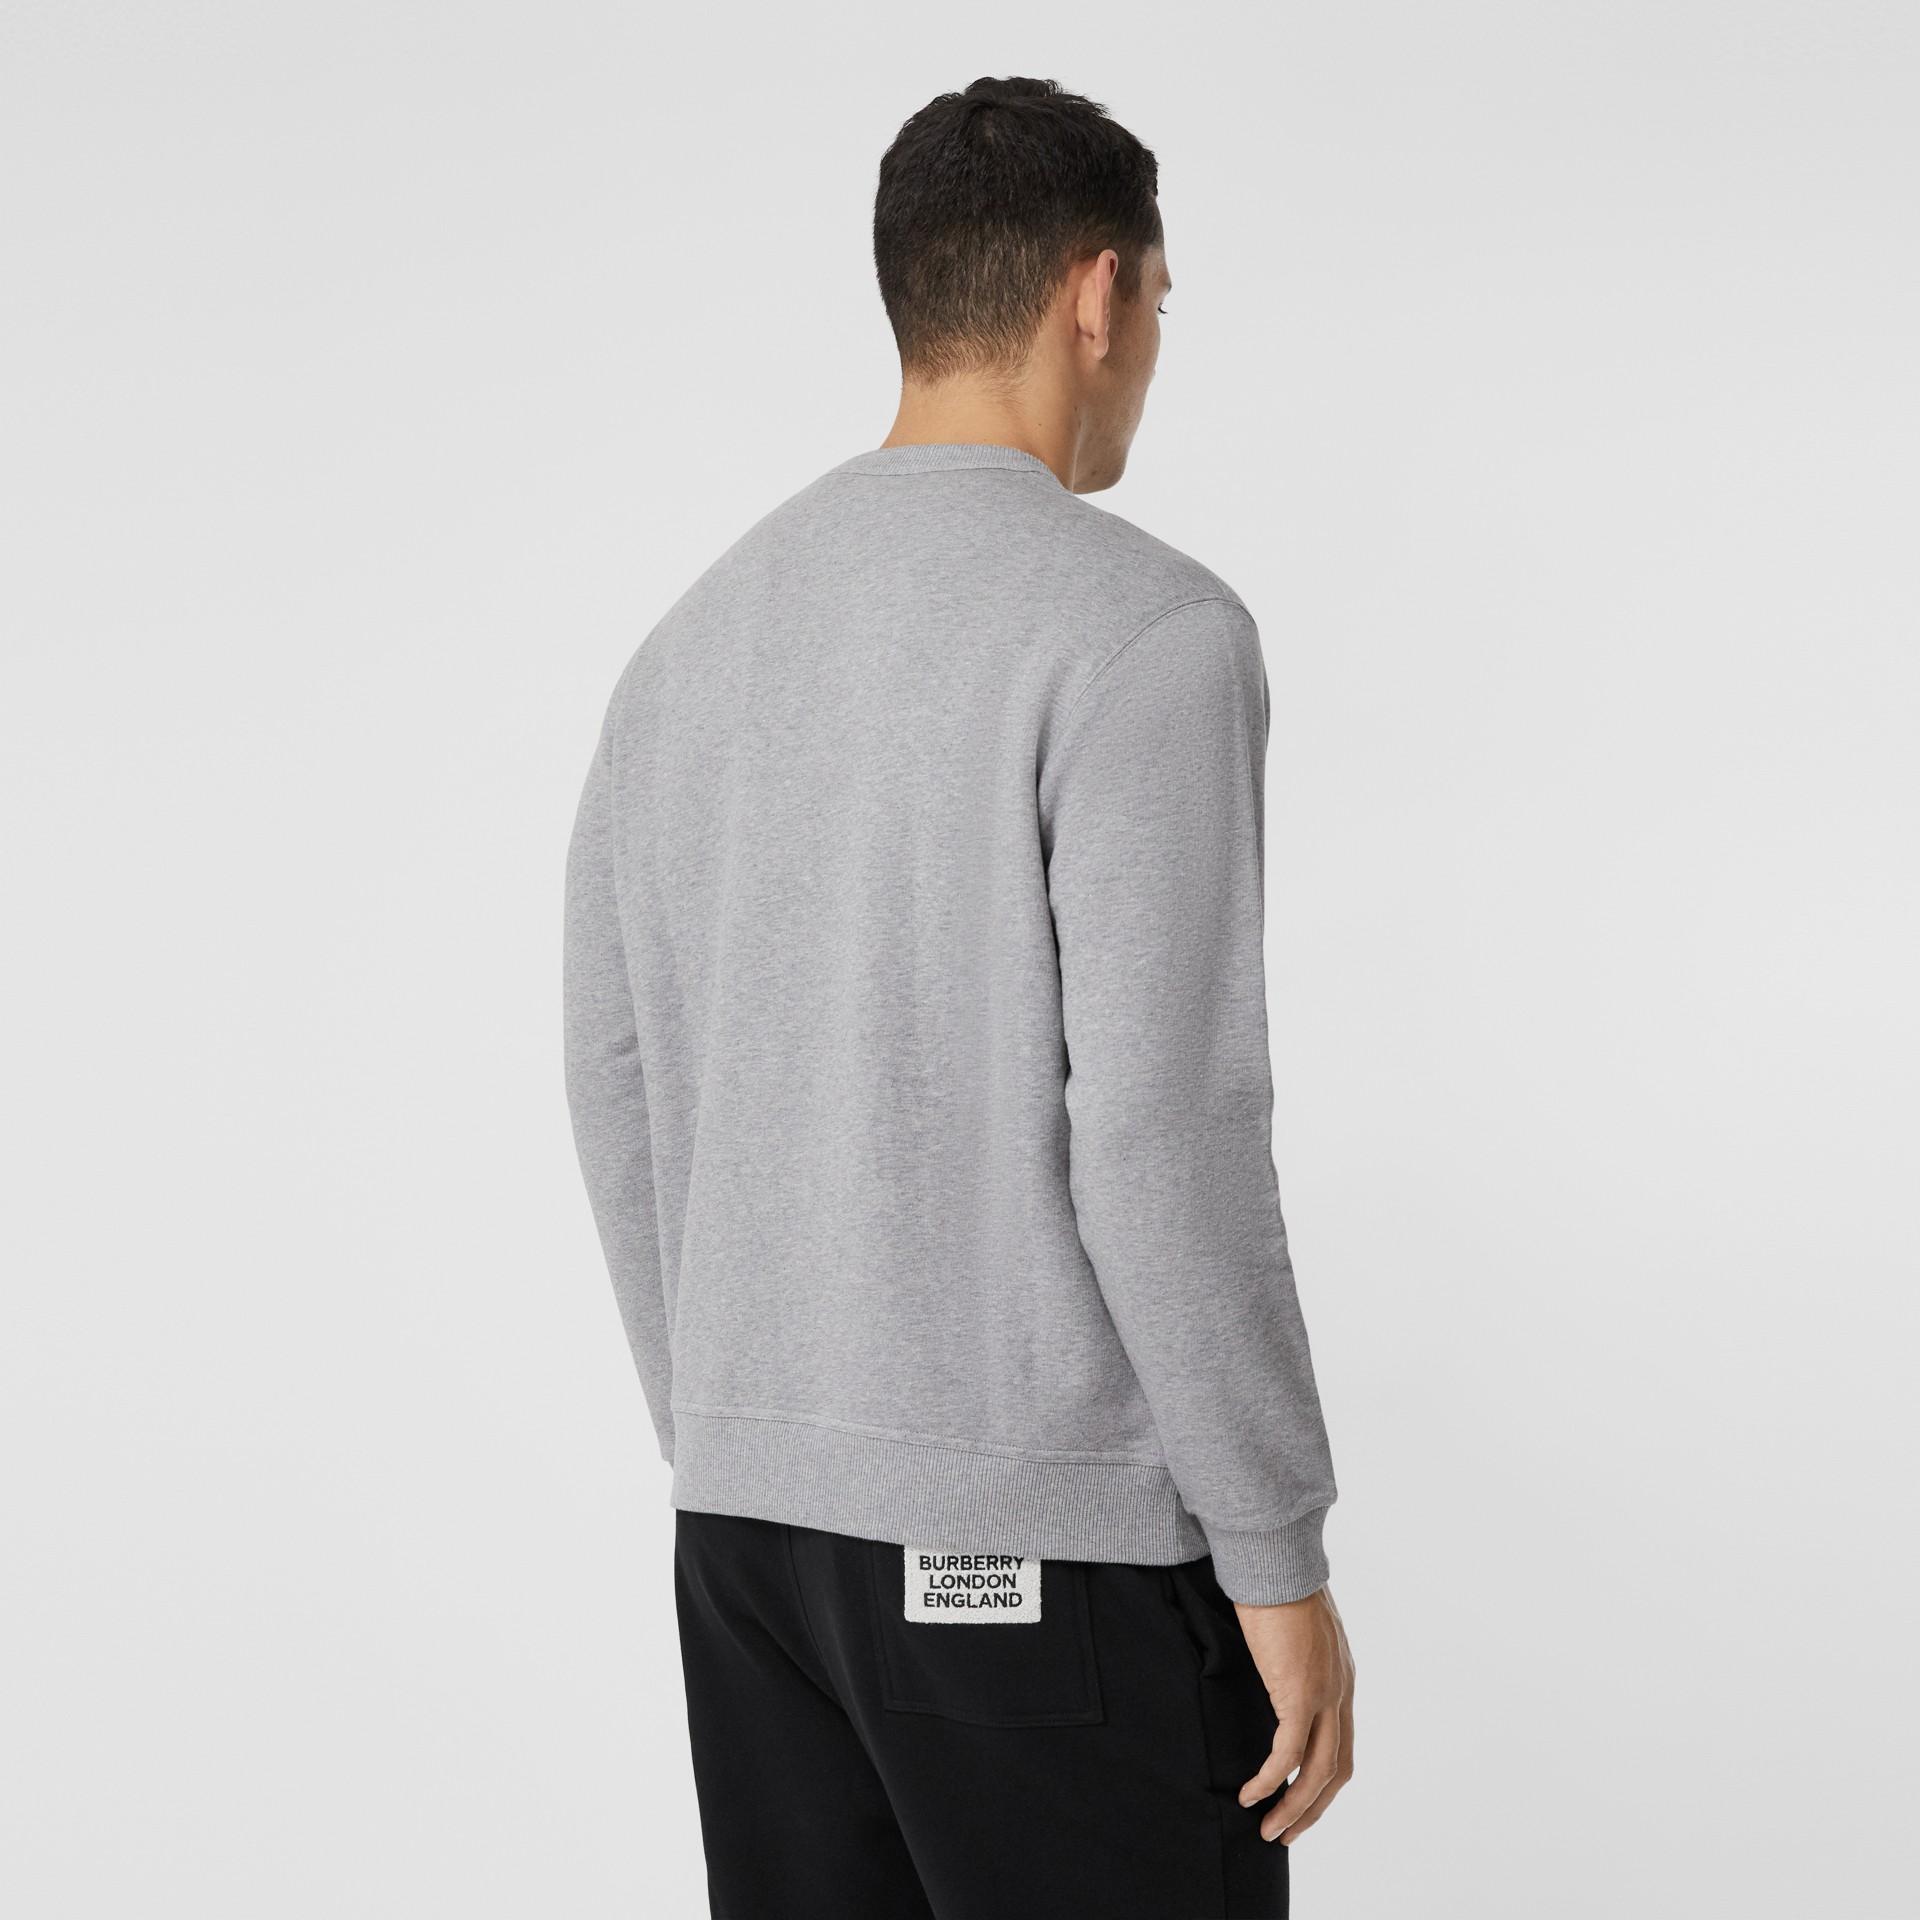 Union Jack Photo Print Cotton Sweatshirt in Pale Grey Melange - Men | Burberry - gallery image 2